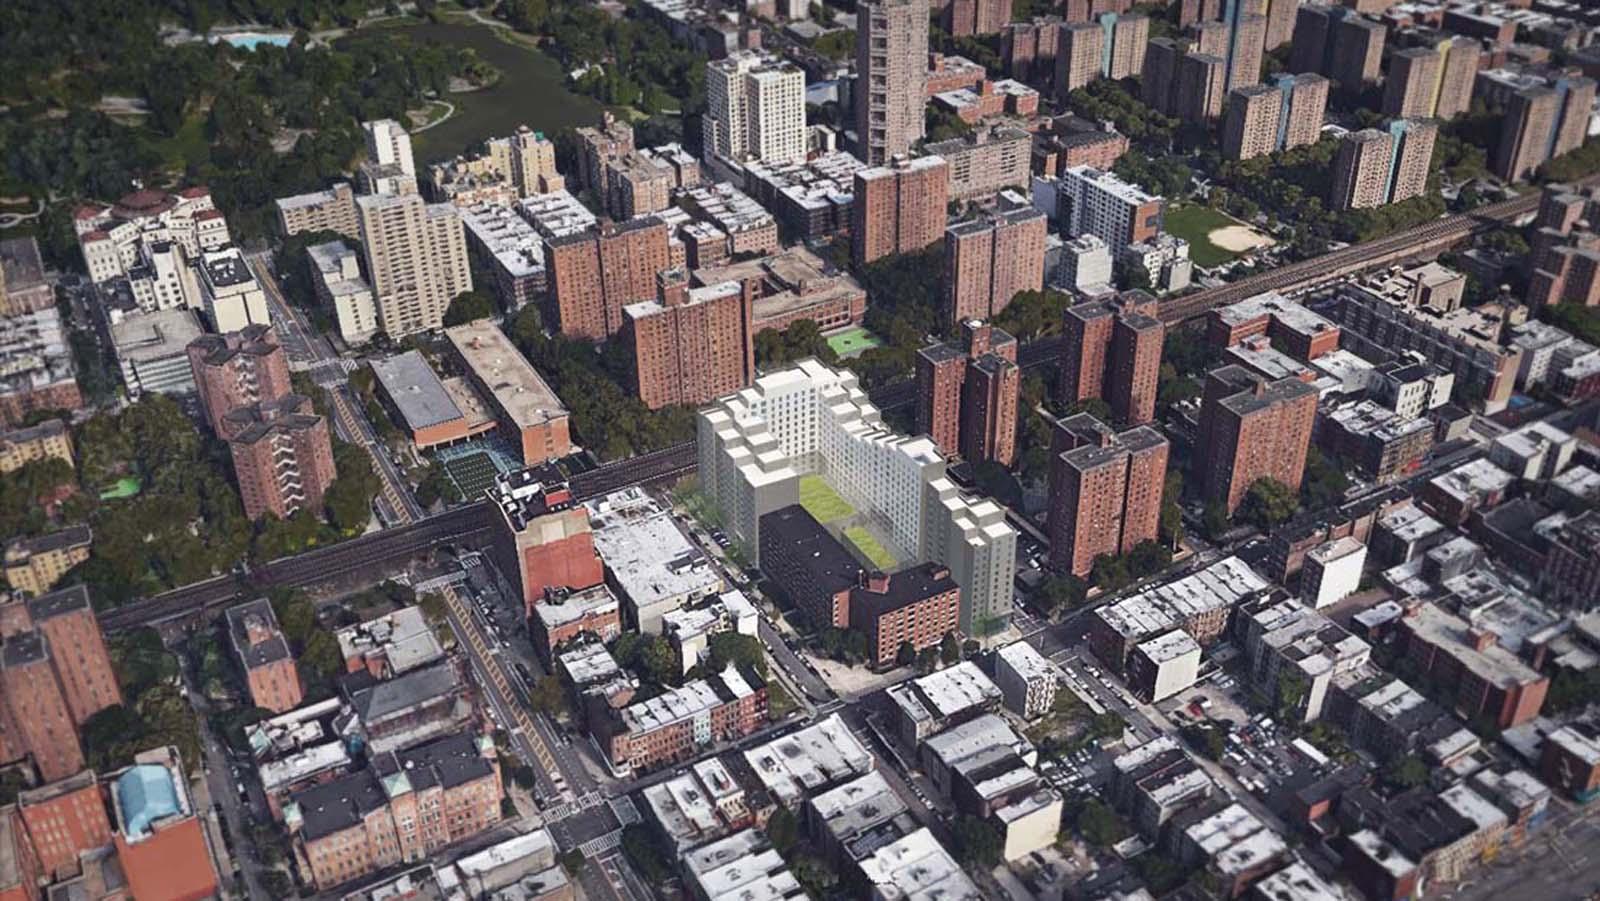 The Carolina, 1465 Park Avenue